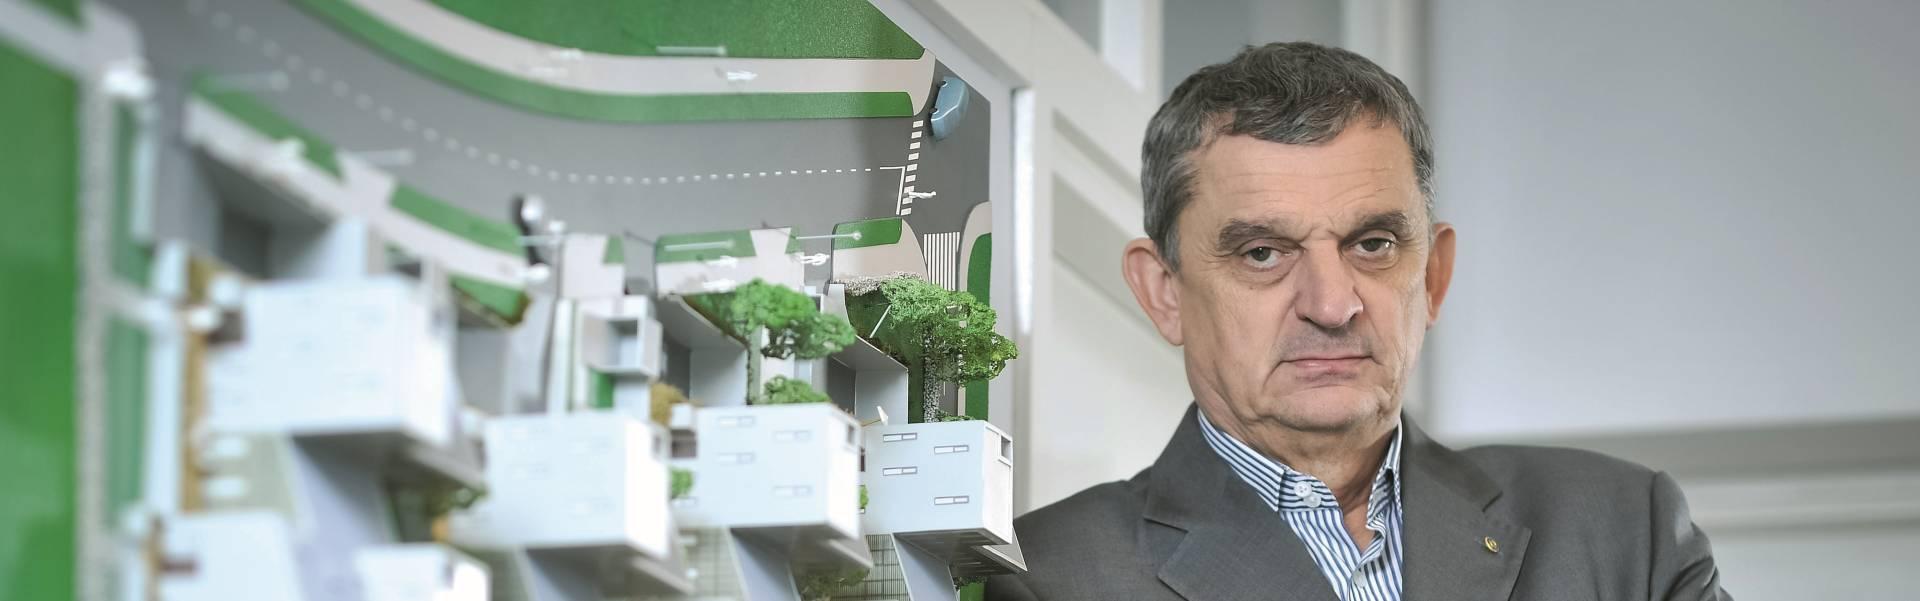 NACIONAL DONOSI: Udar građevinskog poduzetnika na vodstvo Erste banke